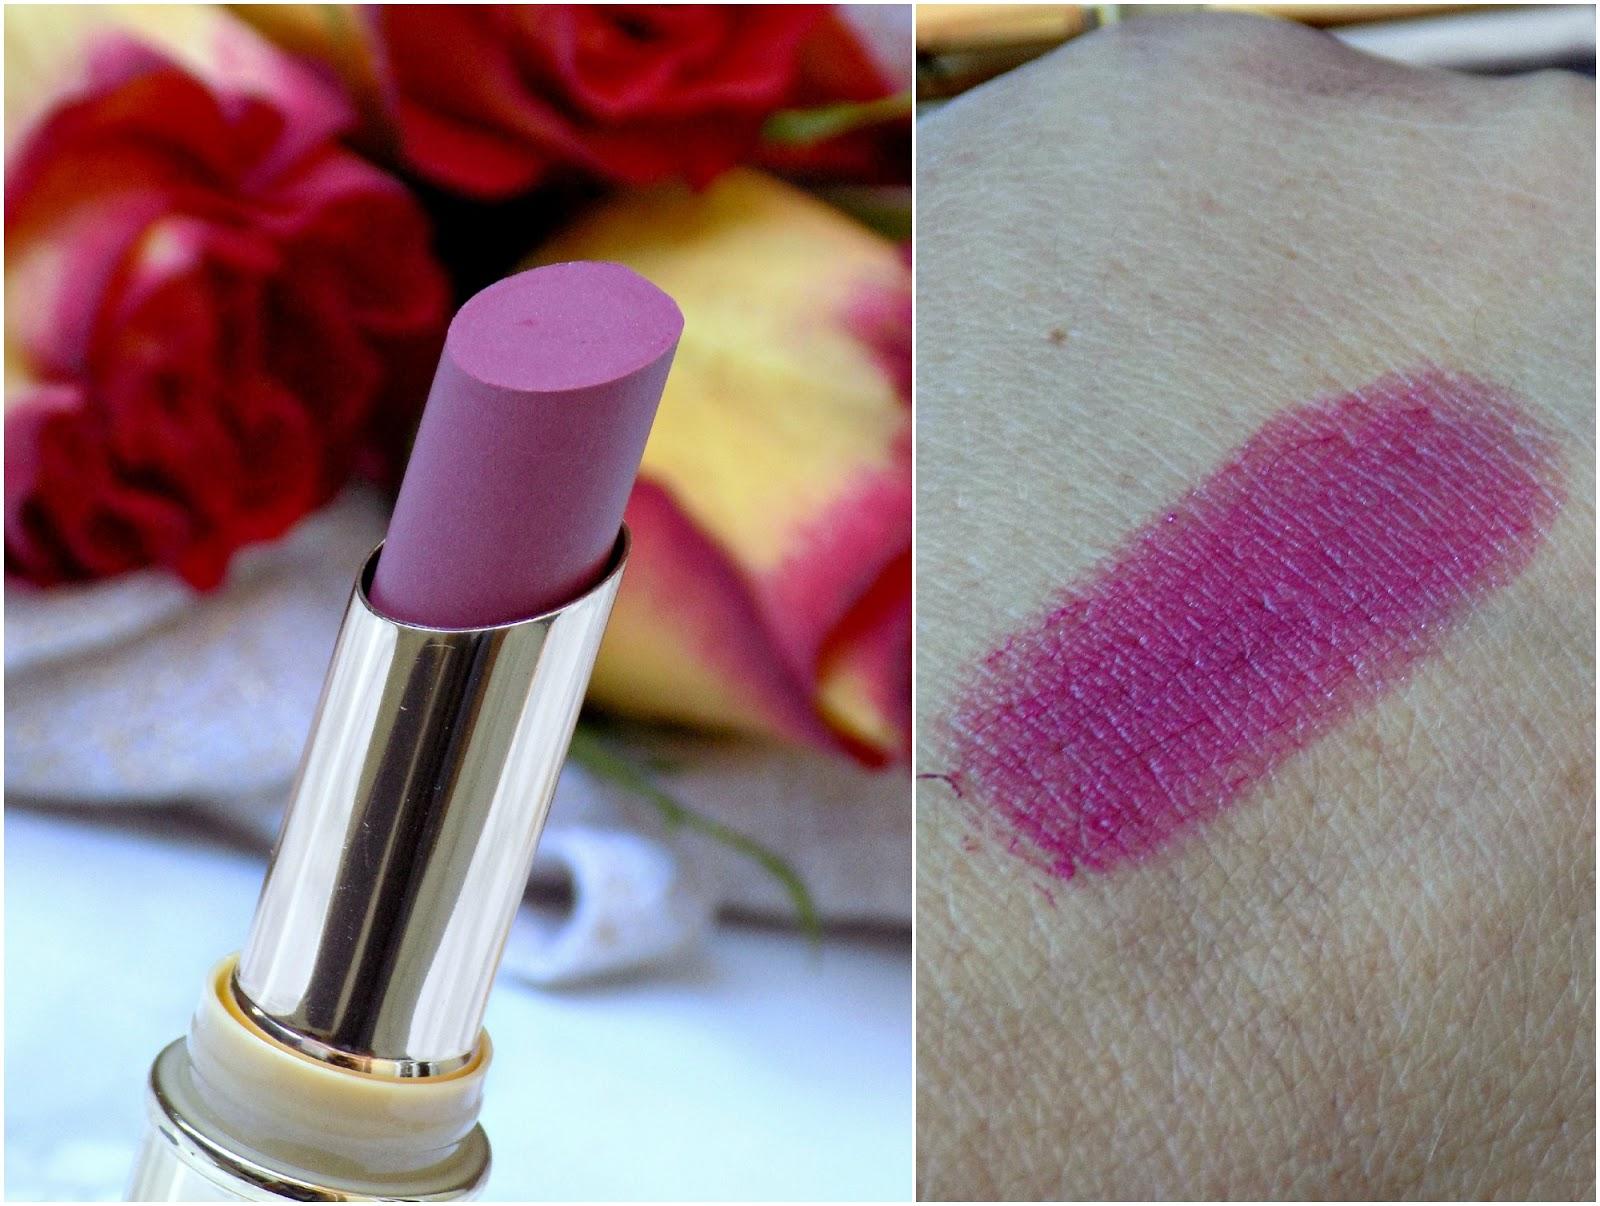 MaxFactor Lipfinity Long Lasting LIpstick Evermore Lush